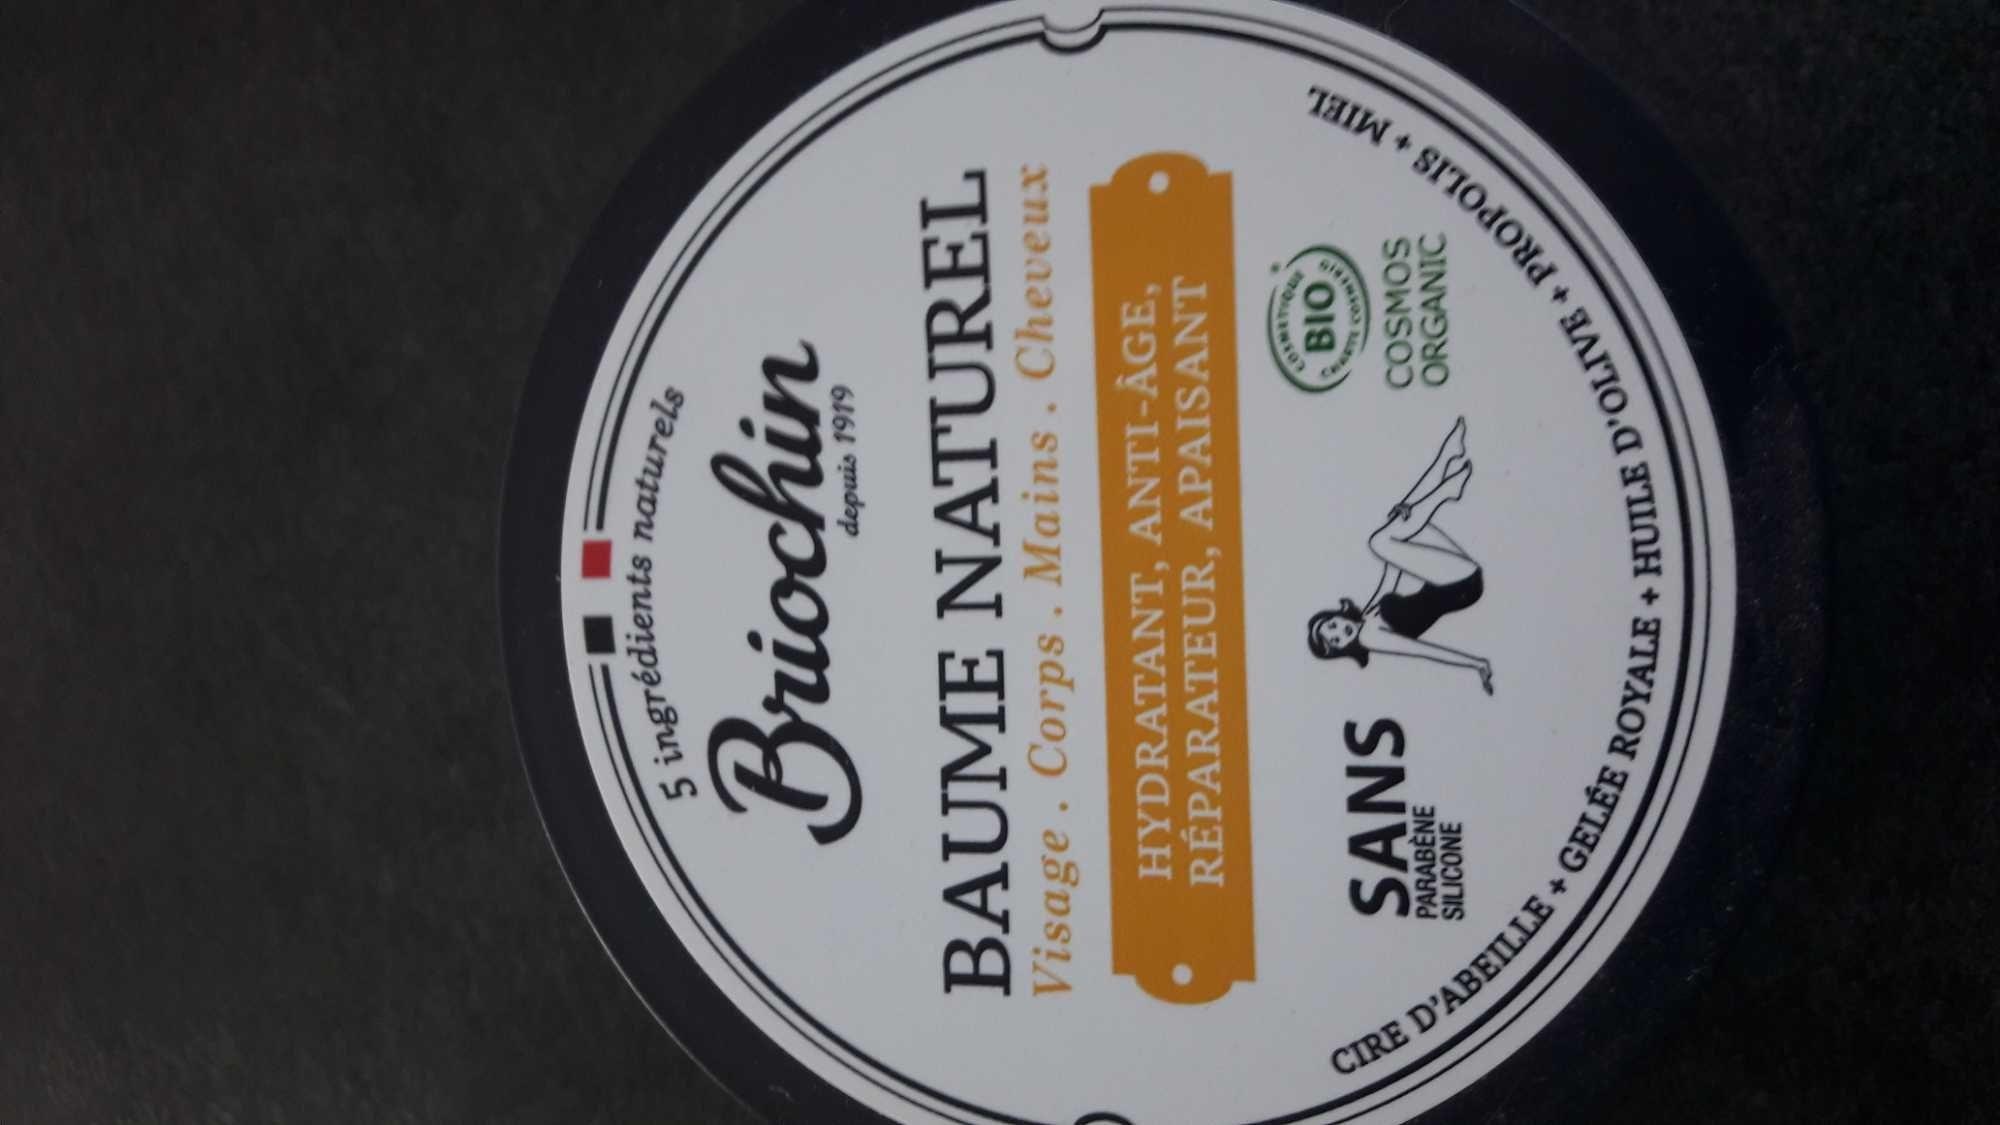 Baume naturel - Product